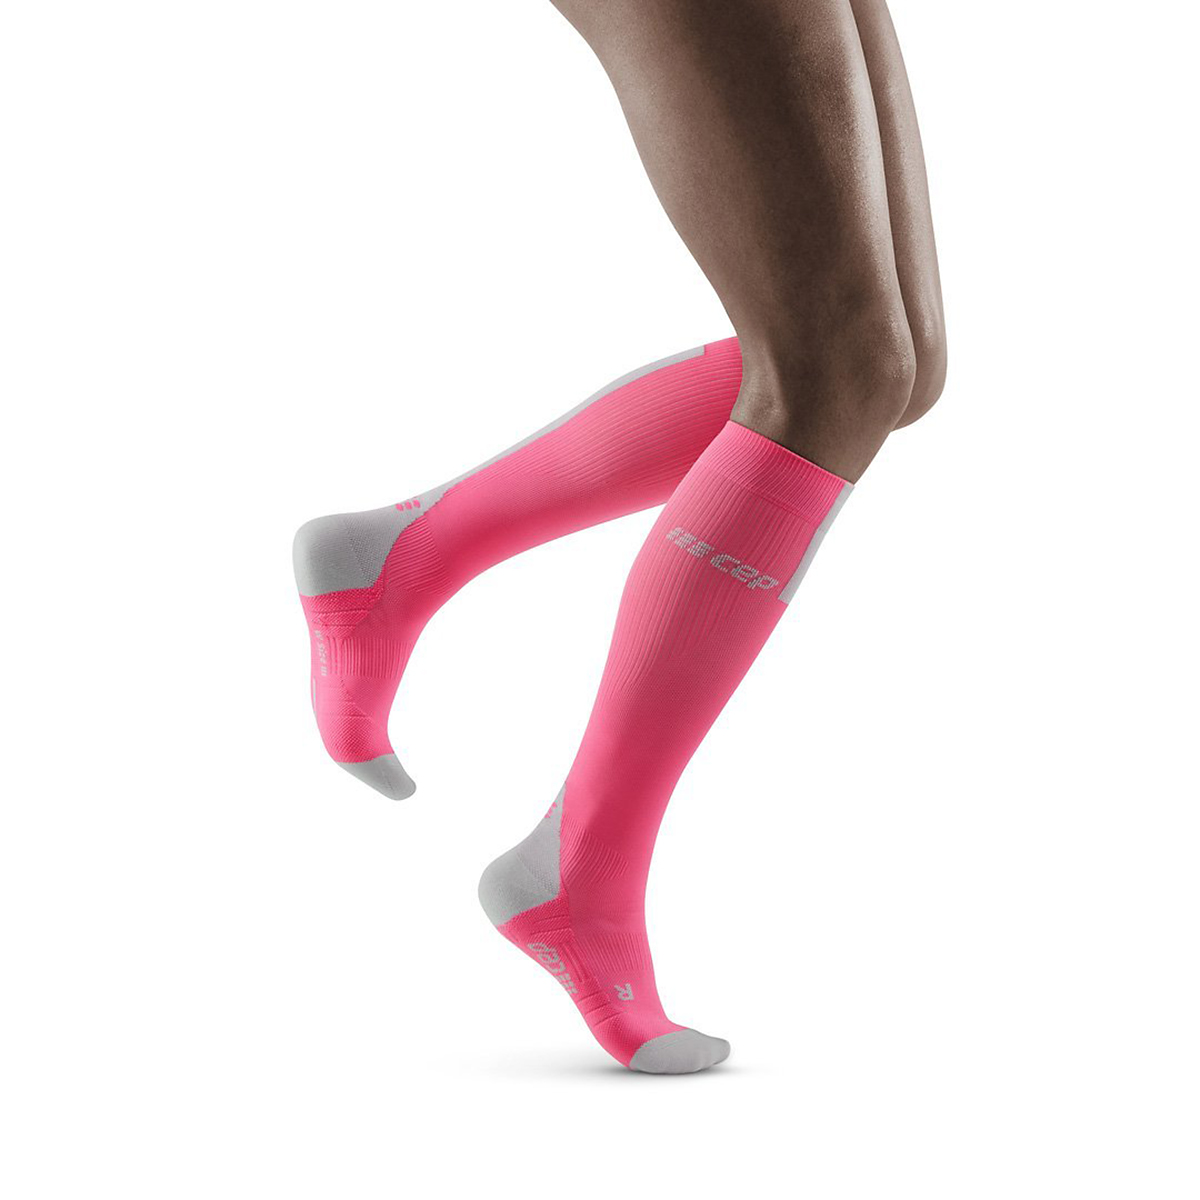 Women's Cep Compression Compression Tall Socks 3.0 - Color: Rose/Light Grey - Size: II, Rose/Light Grey, large, image 1